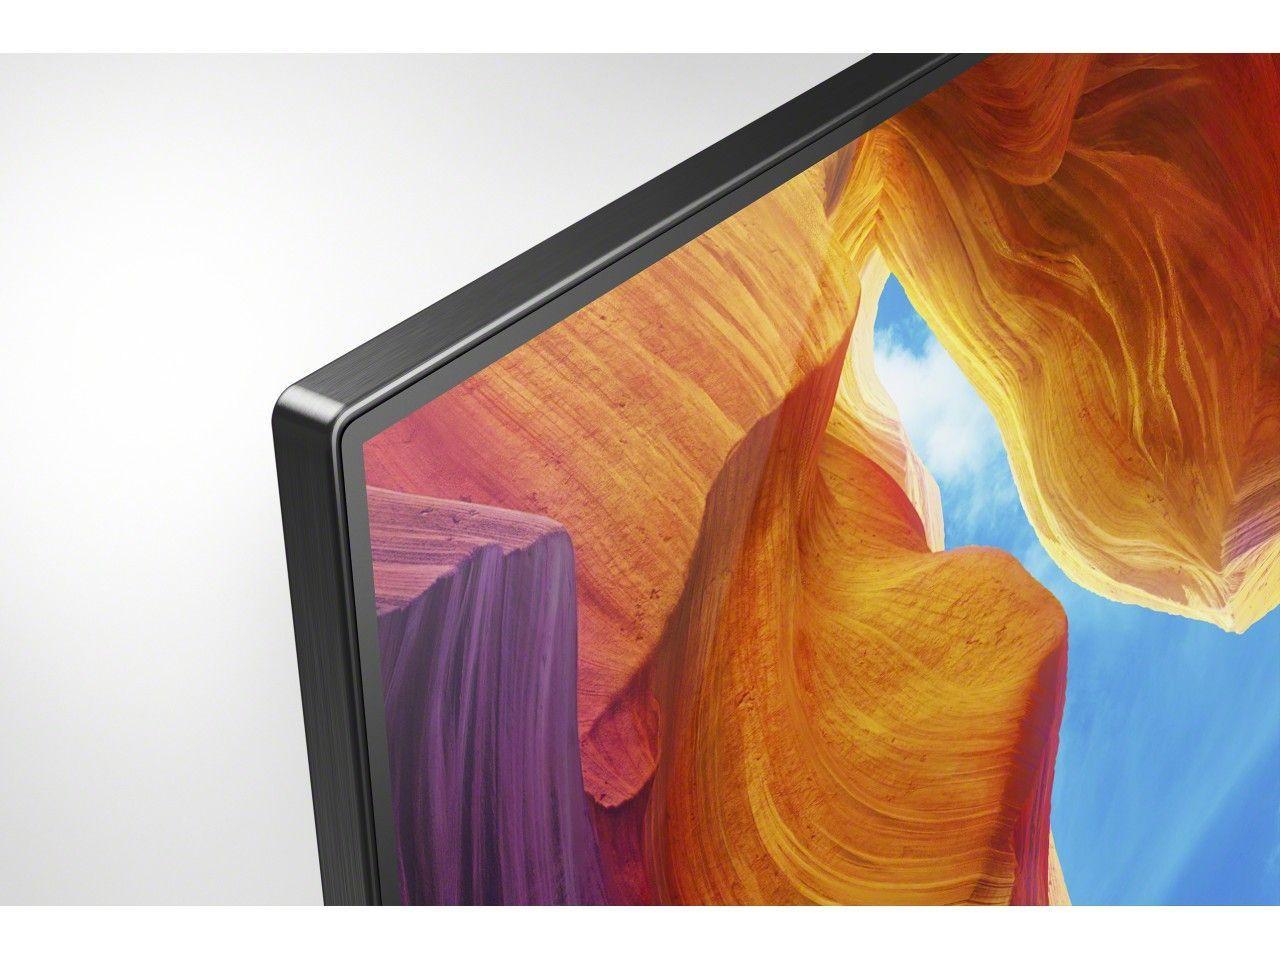 Smart televizor LG OLED55B9SLA.AEU - Televizori - TV - TV